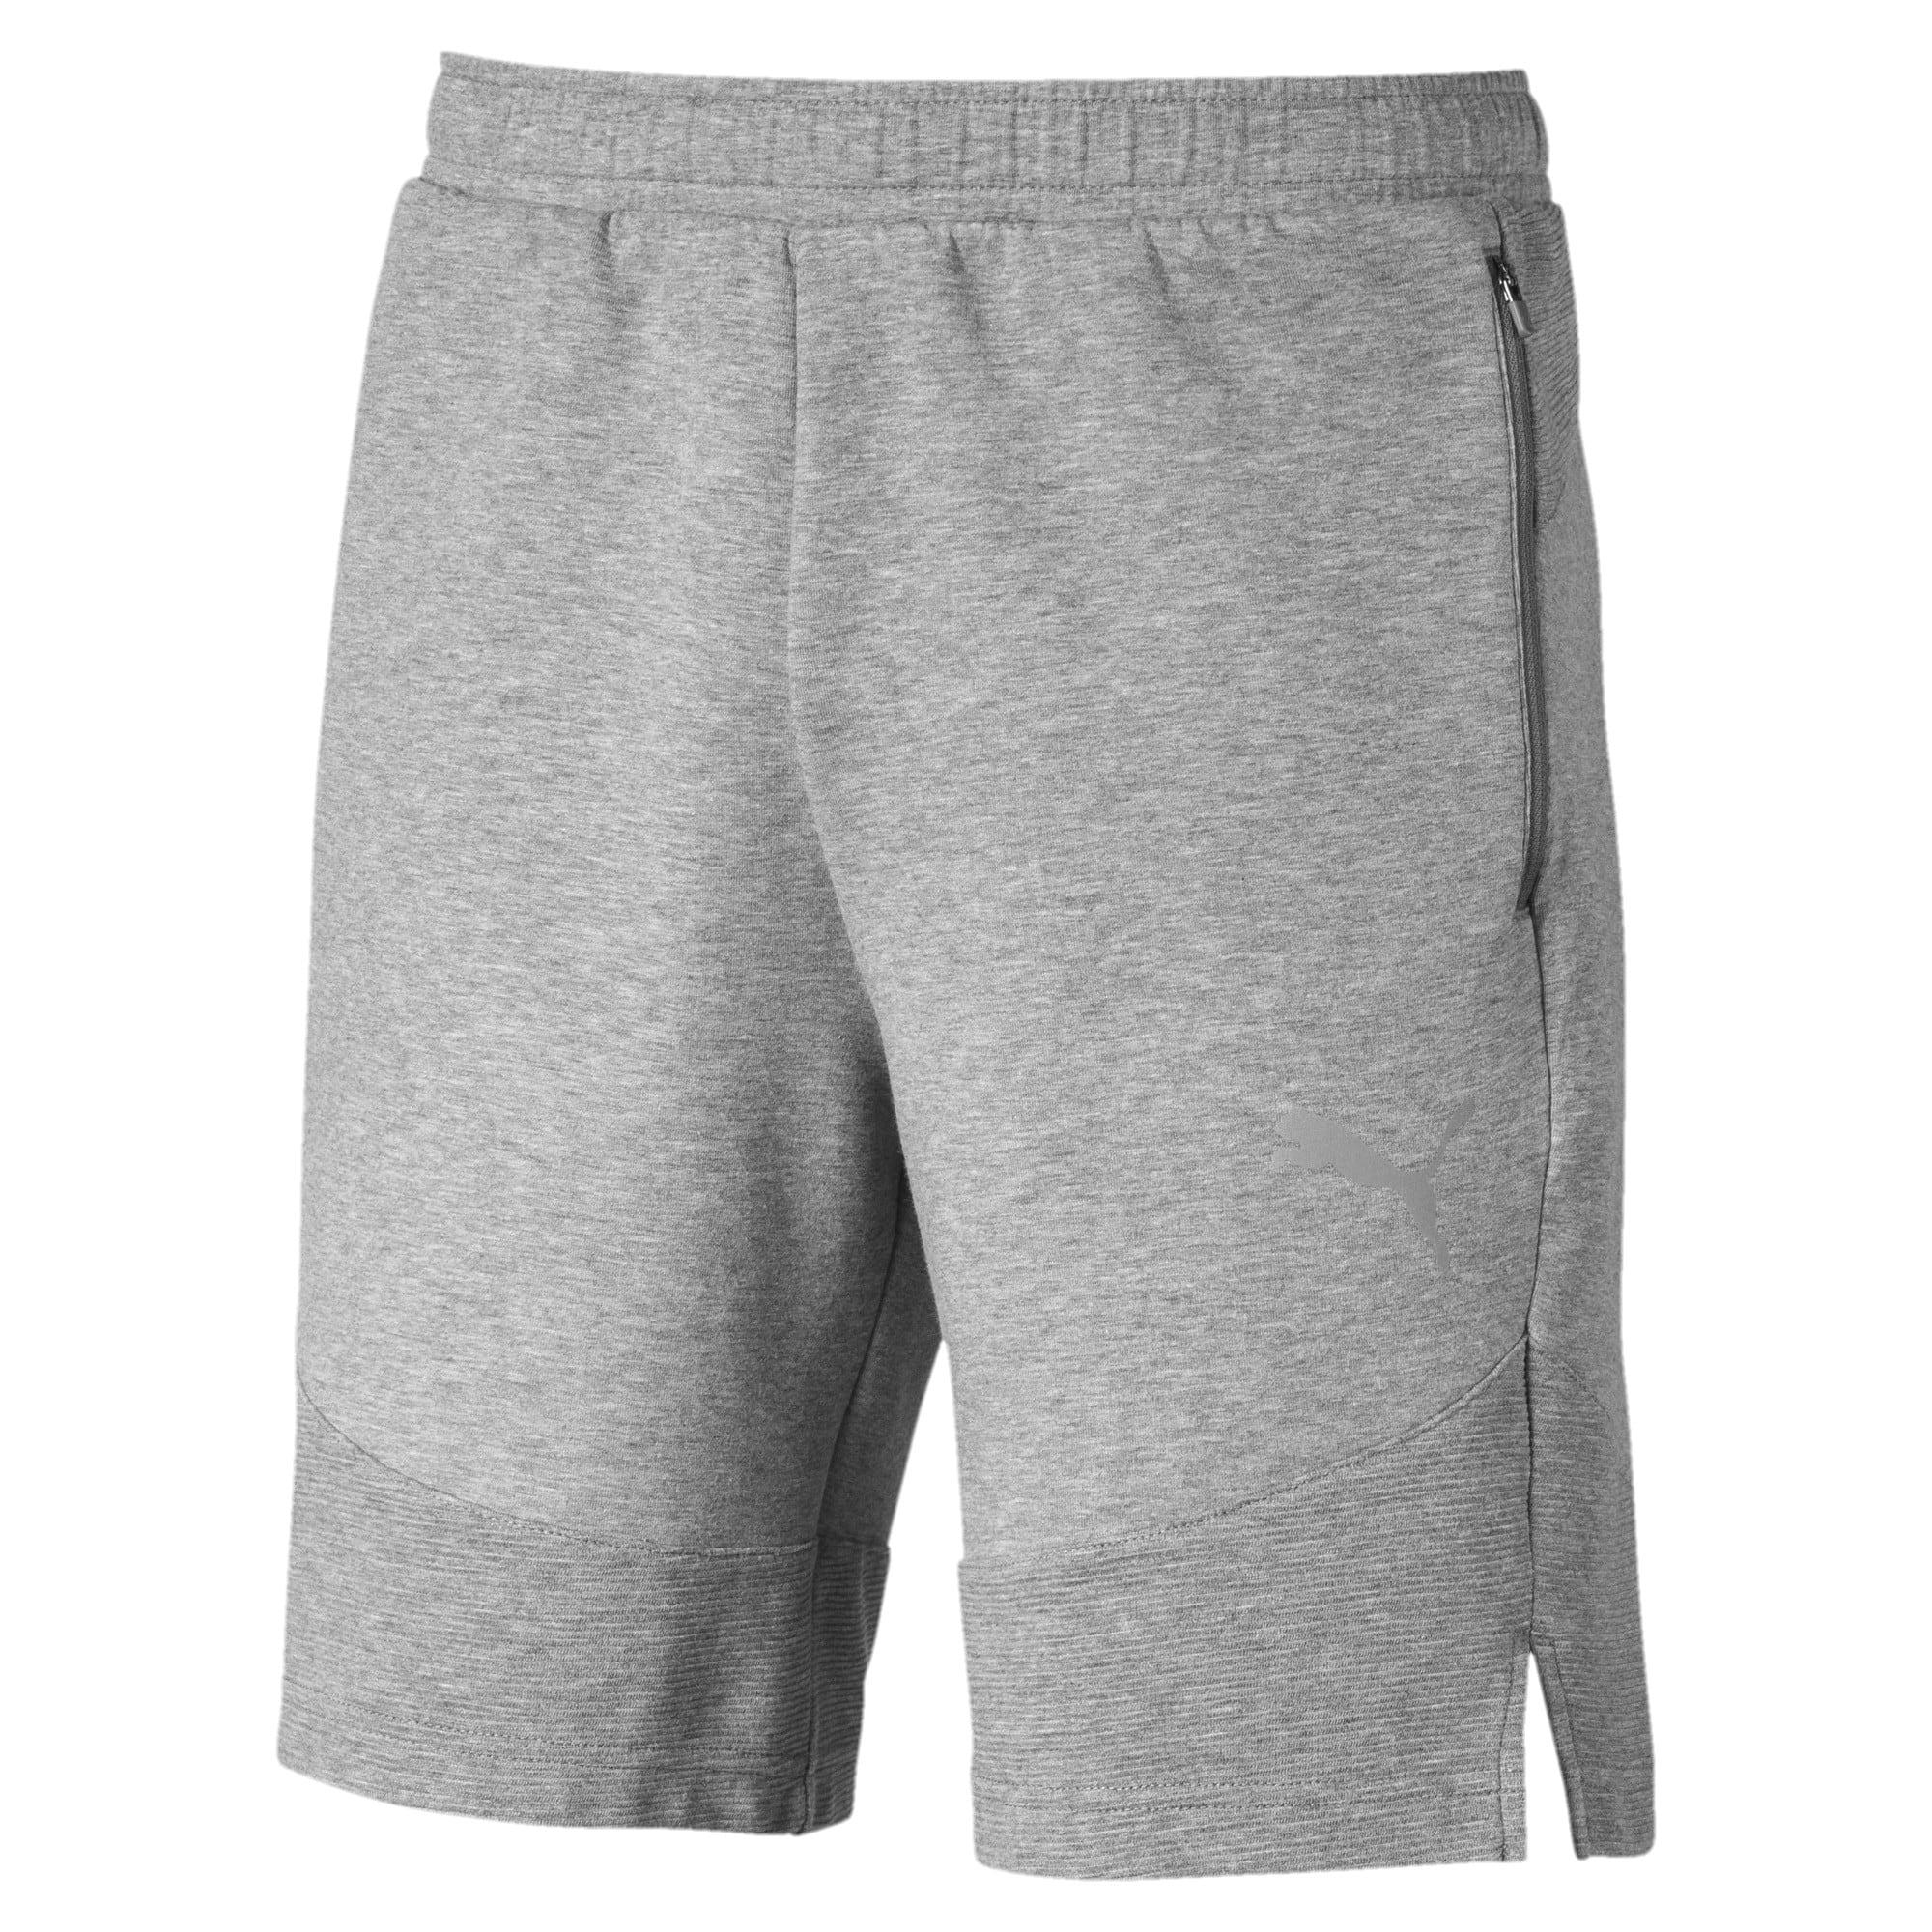 Thumbnail 4 of Evostripe Men's Shorts, Medium Gray Heather, medium